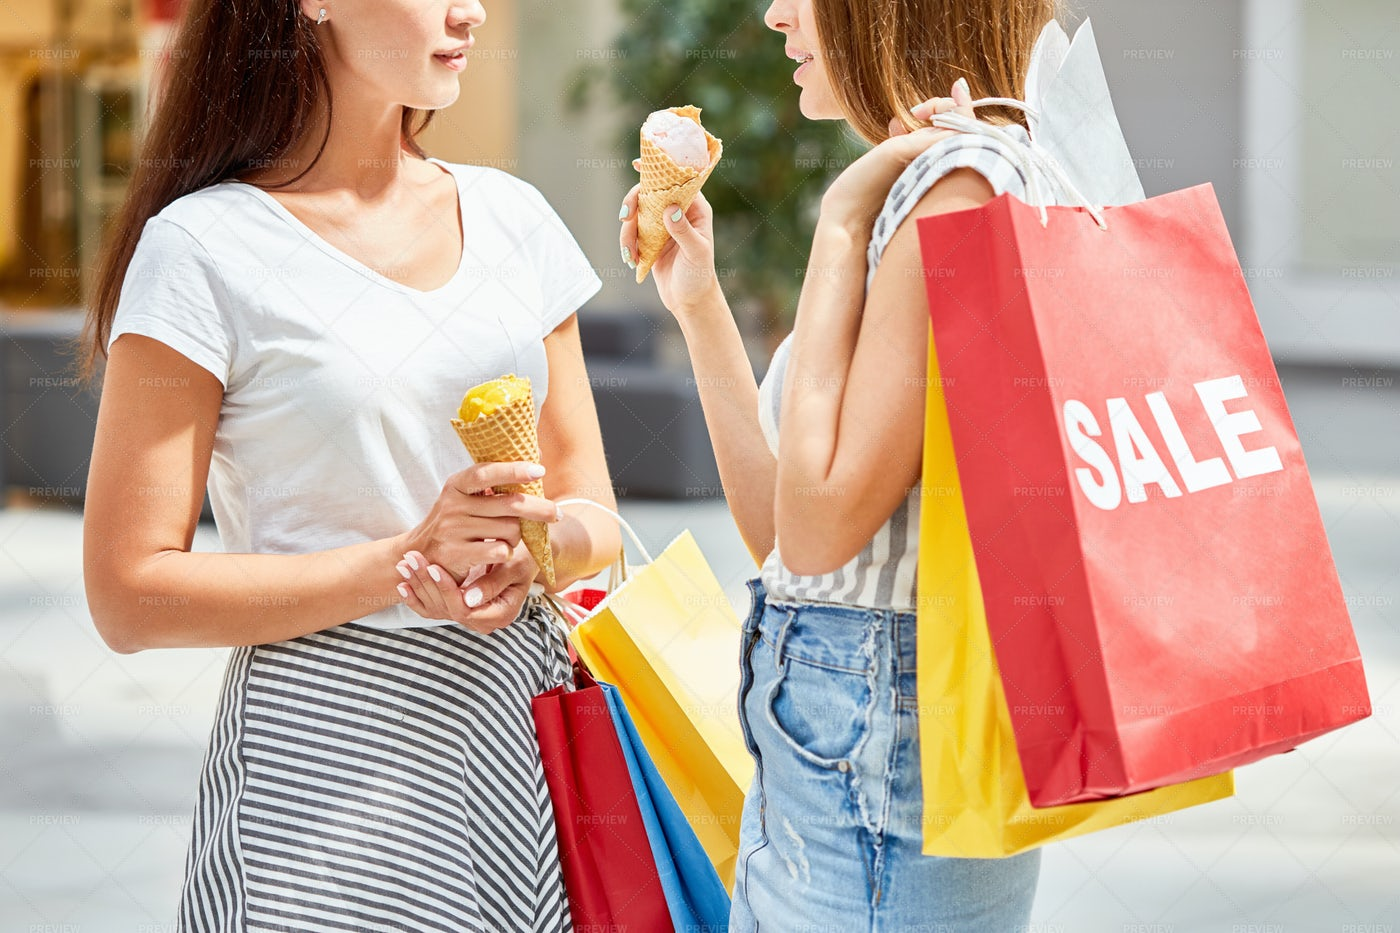 Pretty Girls Shopping On Sale: Stock Photos